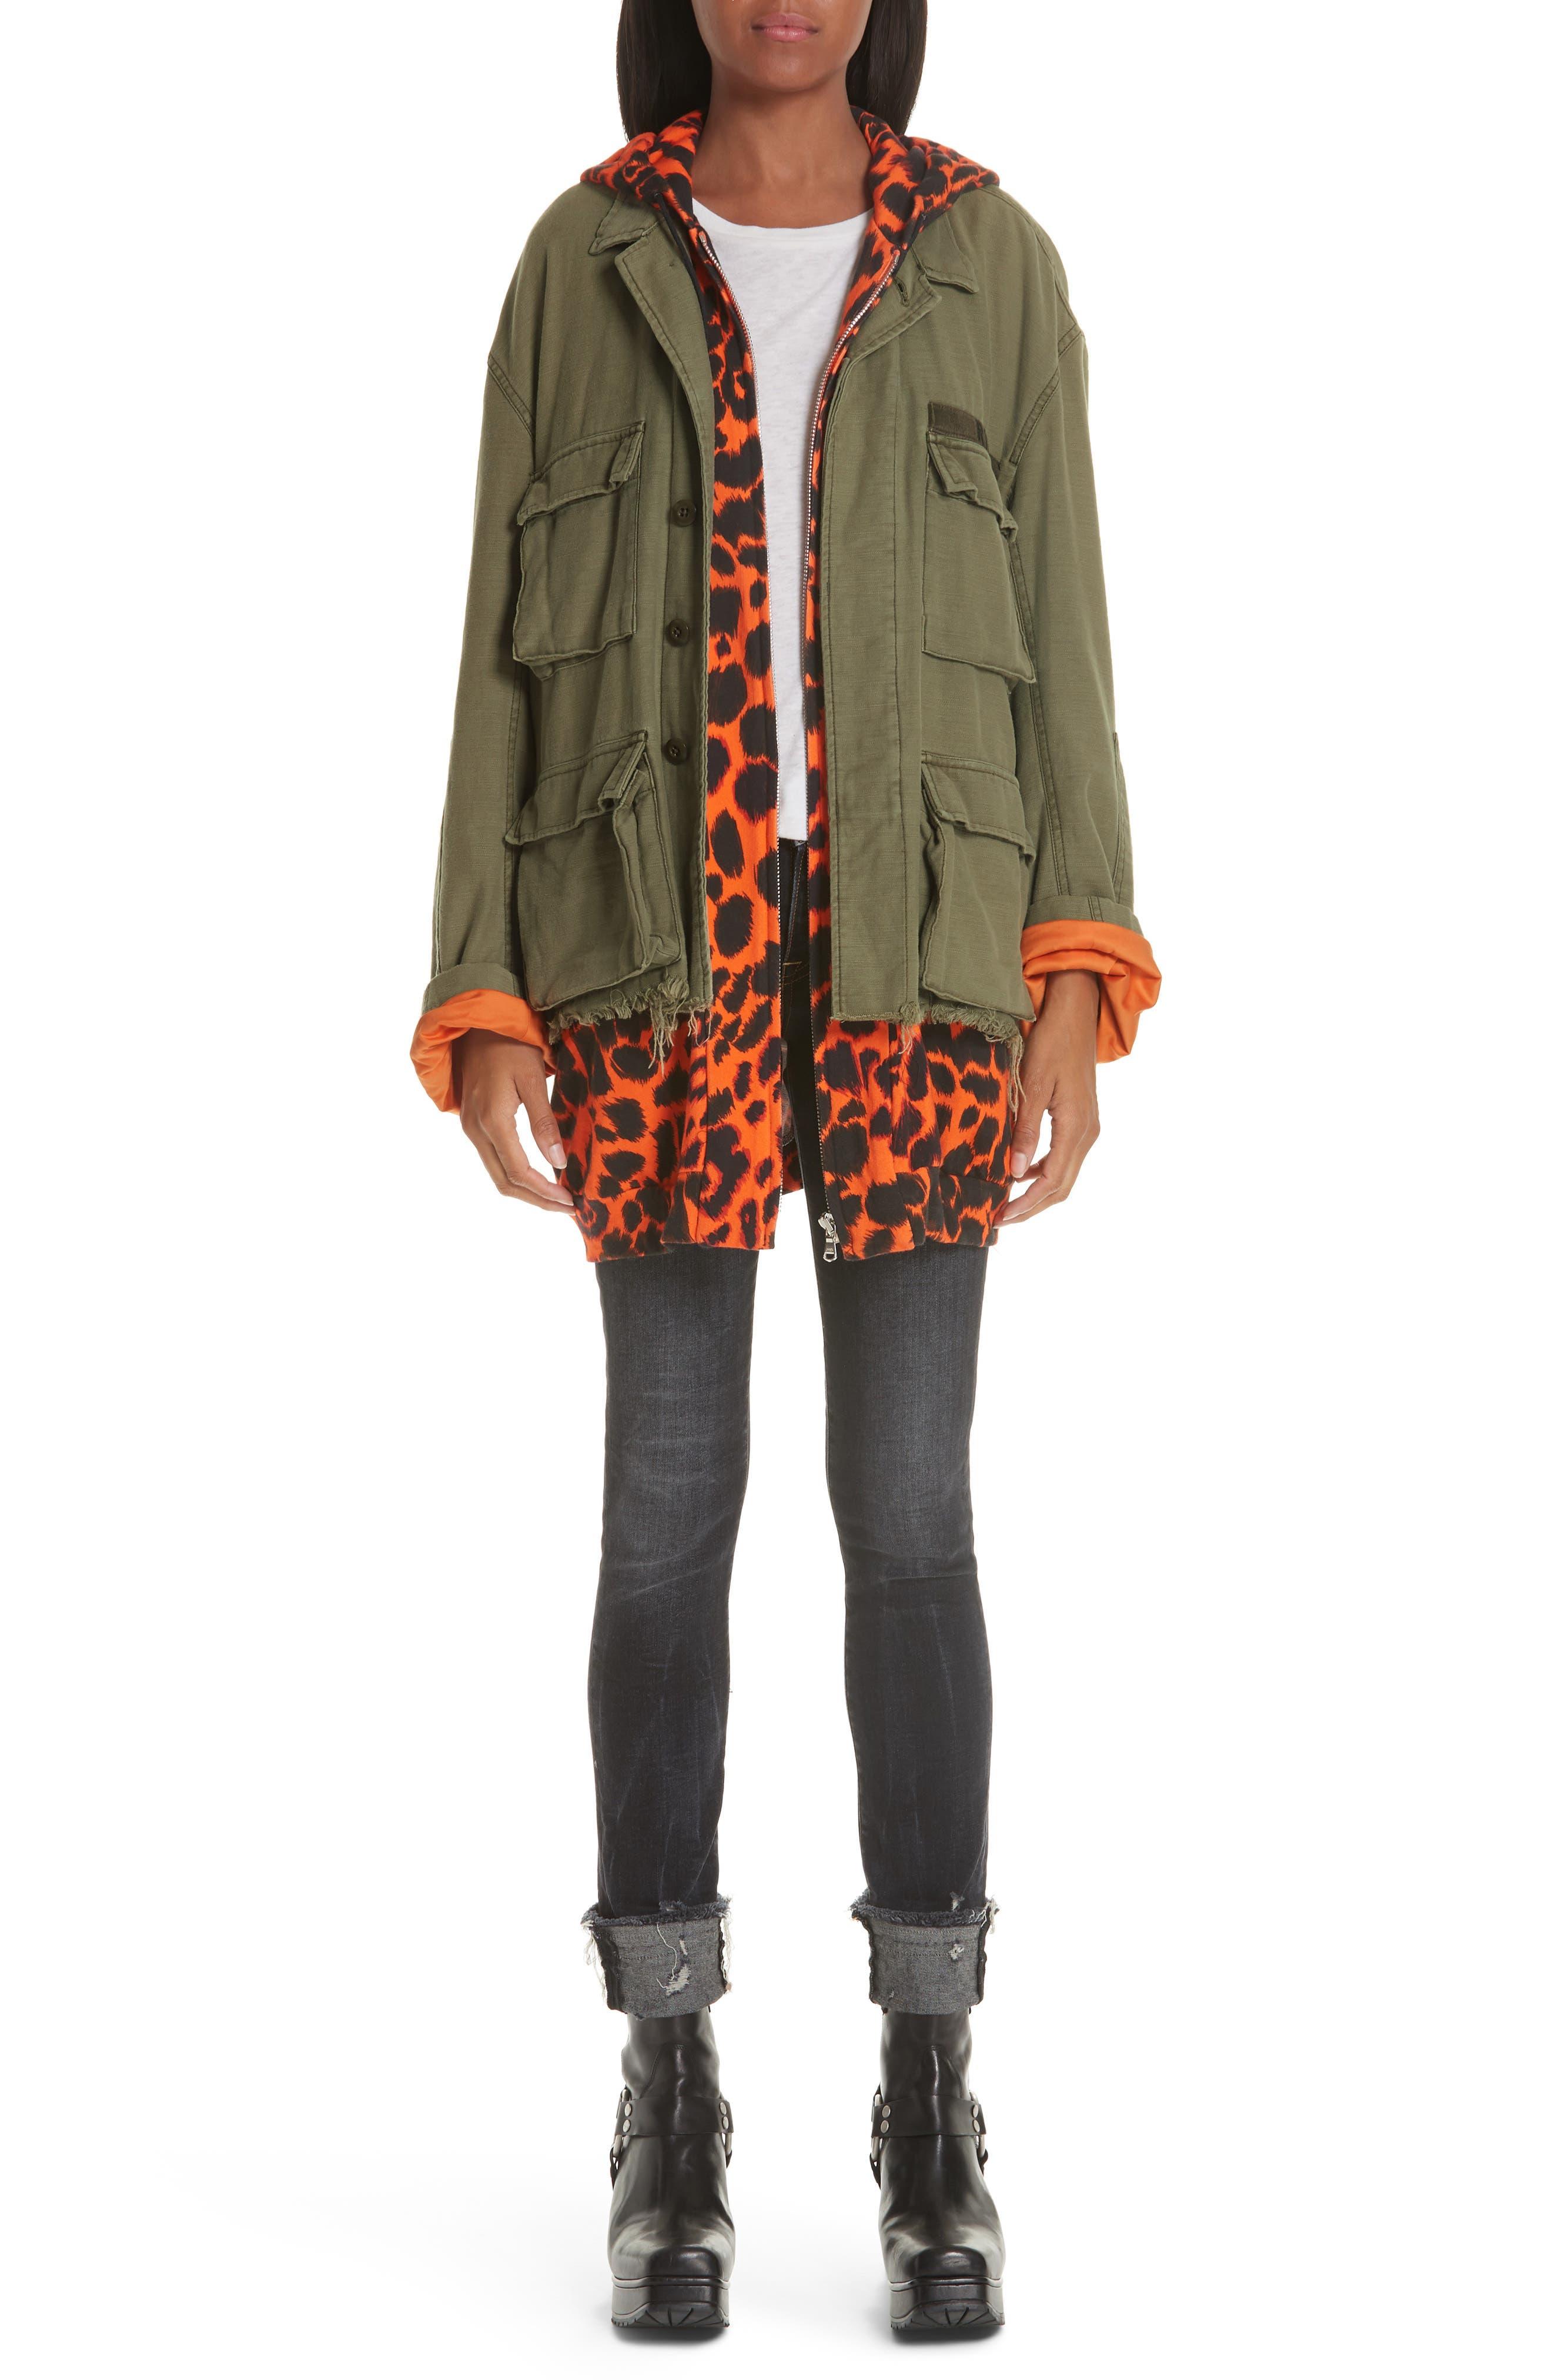 Abu Jacket with Long Leopard Print Hoodie,                             Alternate thumbnail 8, color,                             OLIVE/ ORANGE